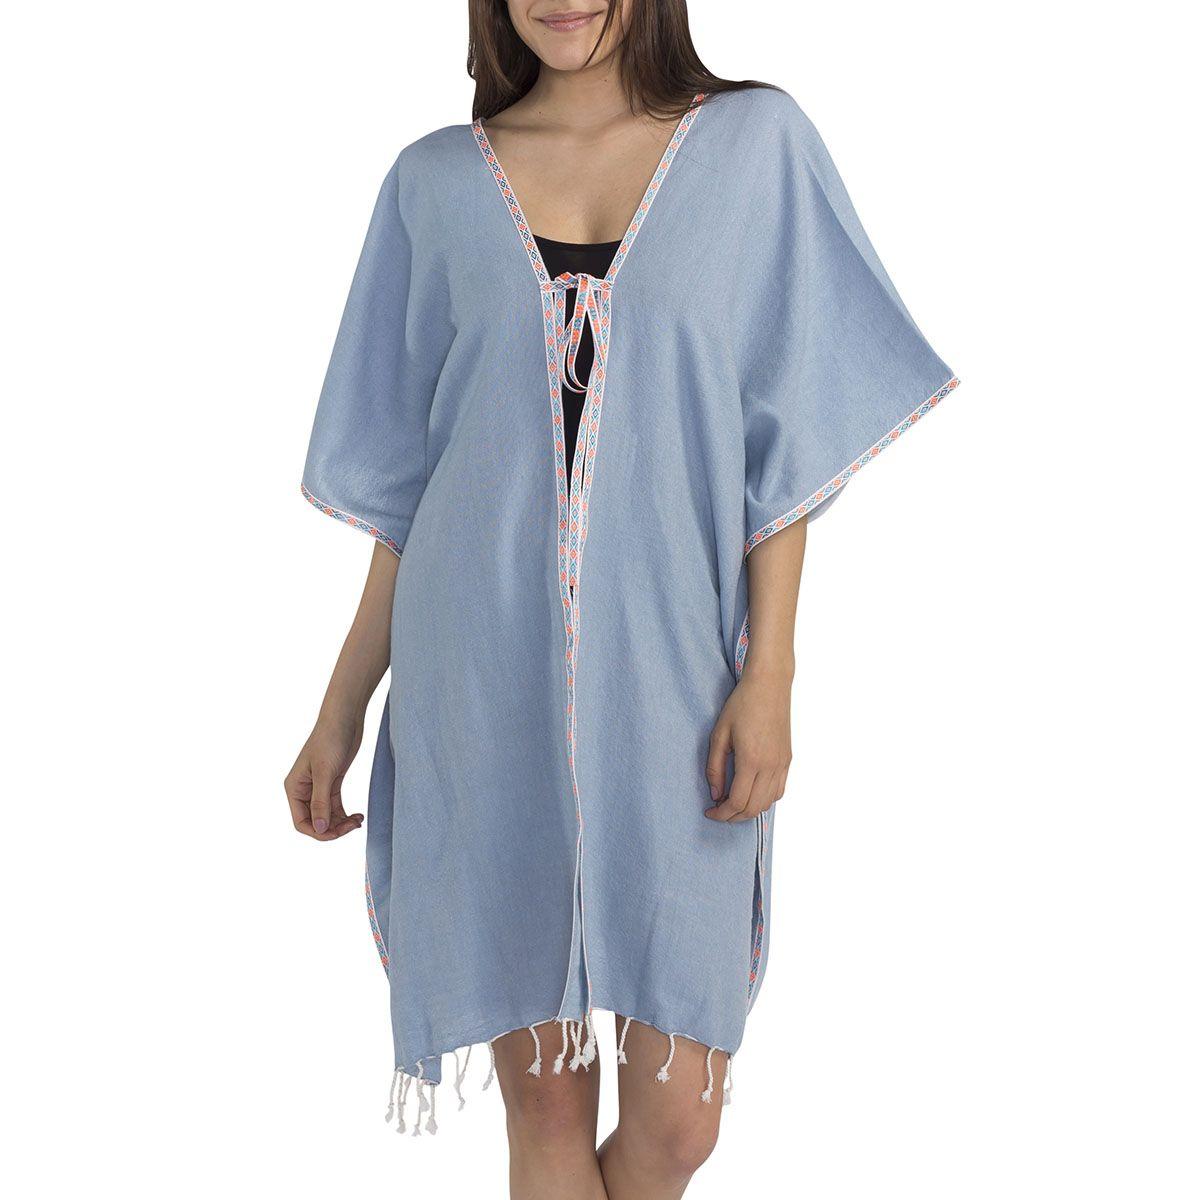 Jacket / Dress - Happy / Blue